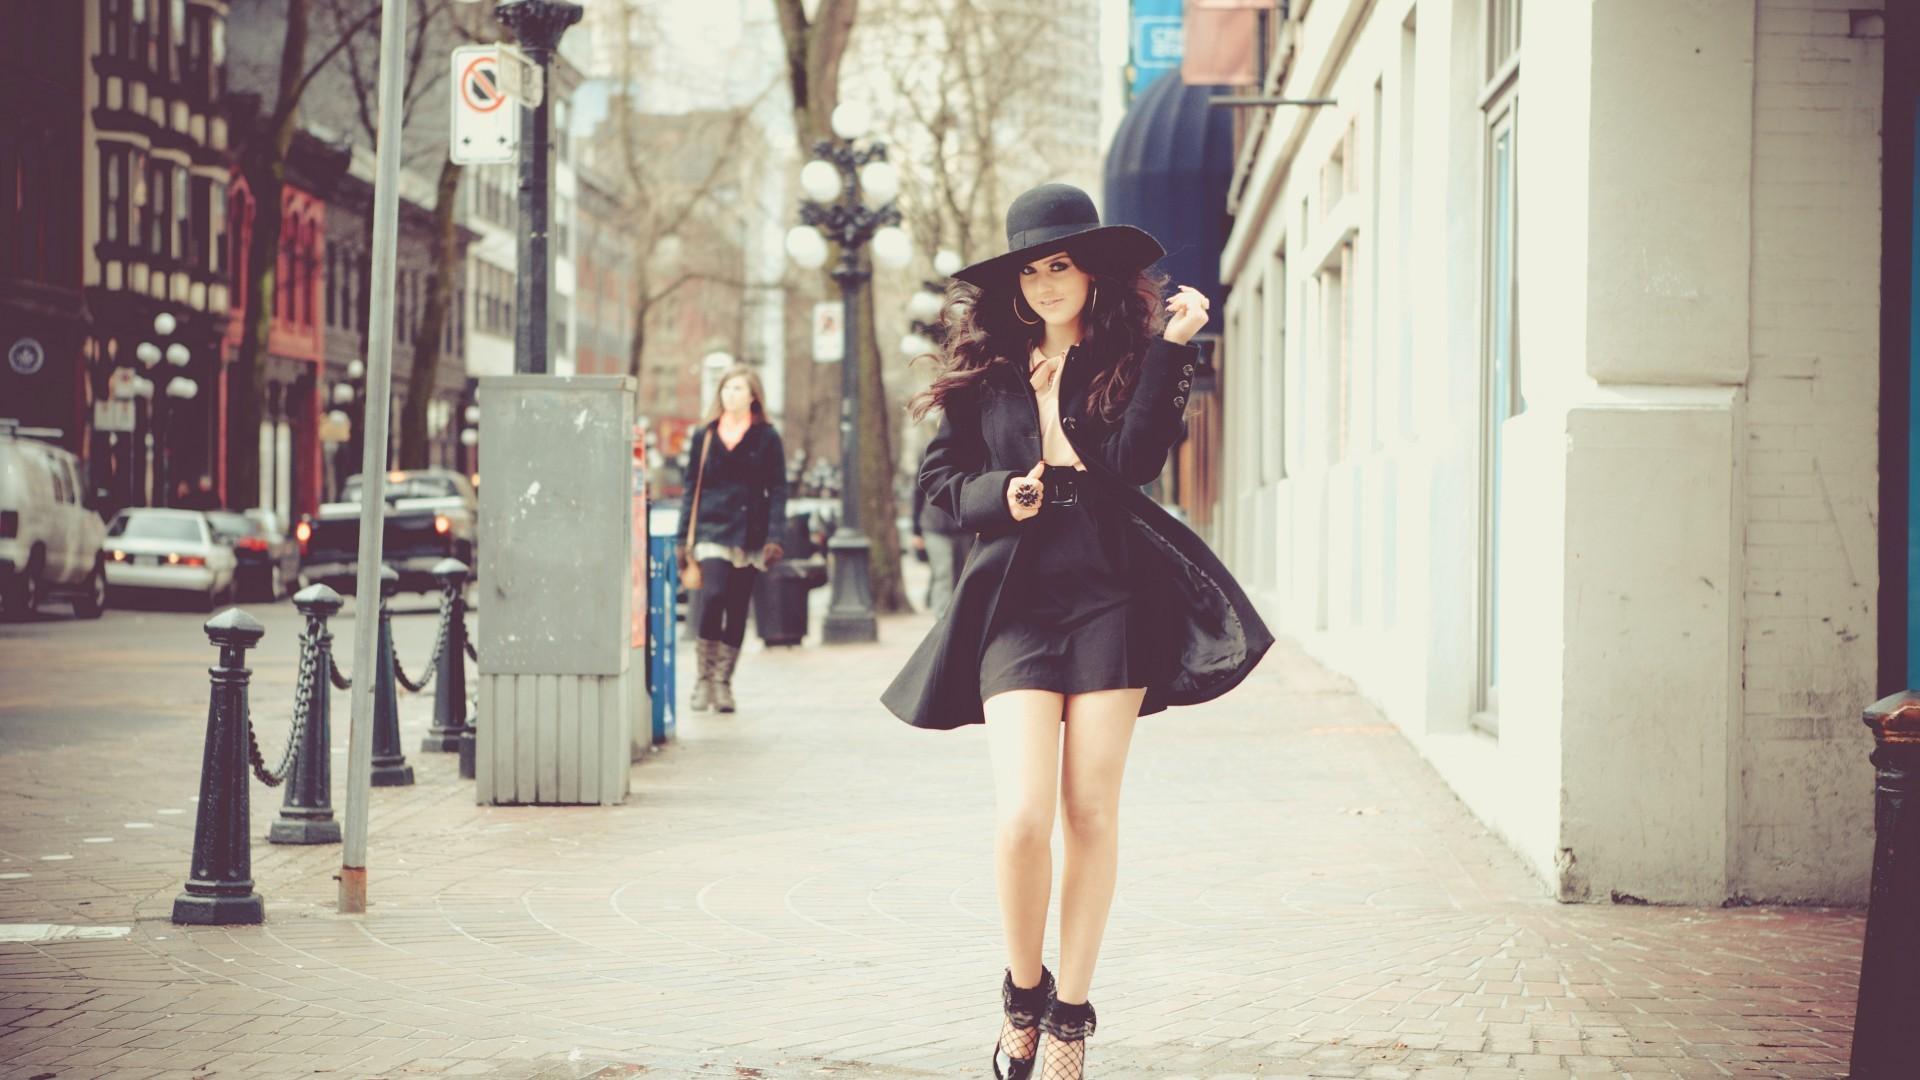 fashion clothes wallpaper - photo #5